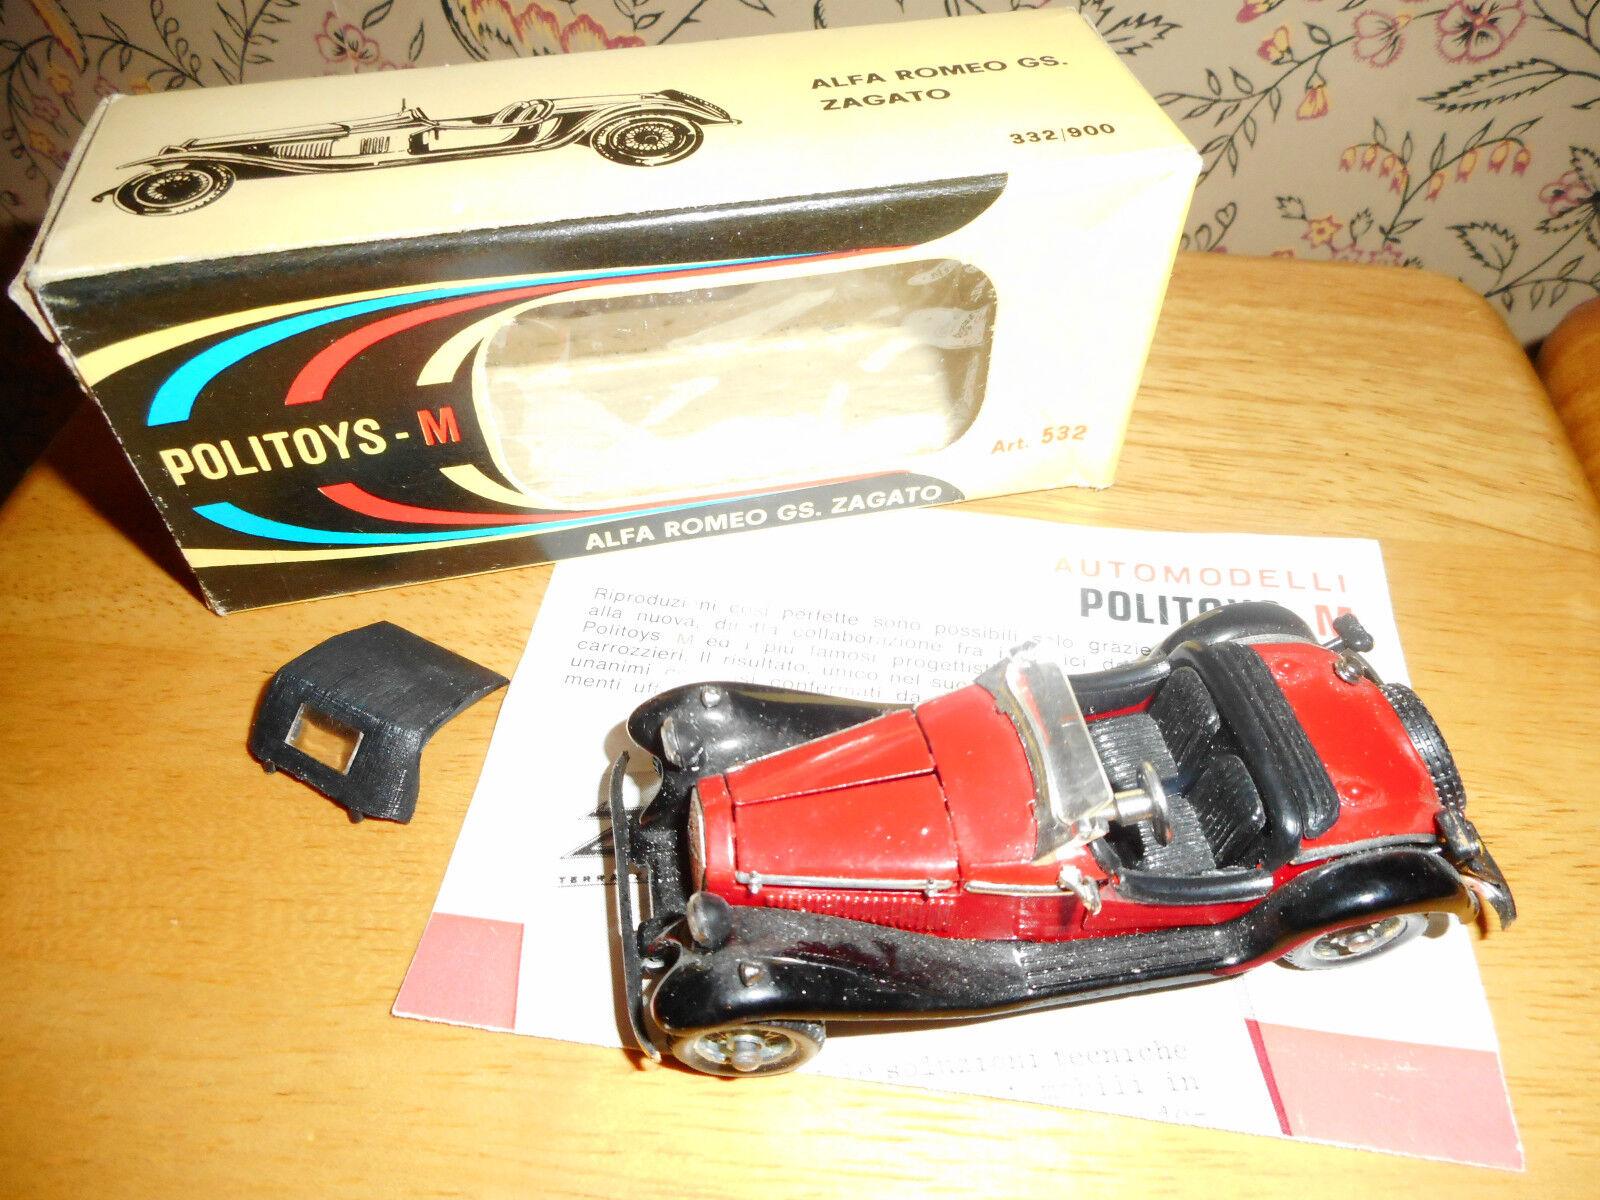 Dinky  POLITOYS ALFA ROMEO GS ZAGATO ref 532  authentique